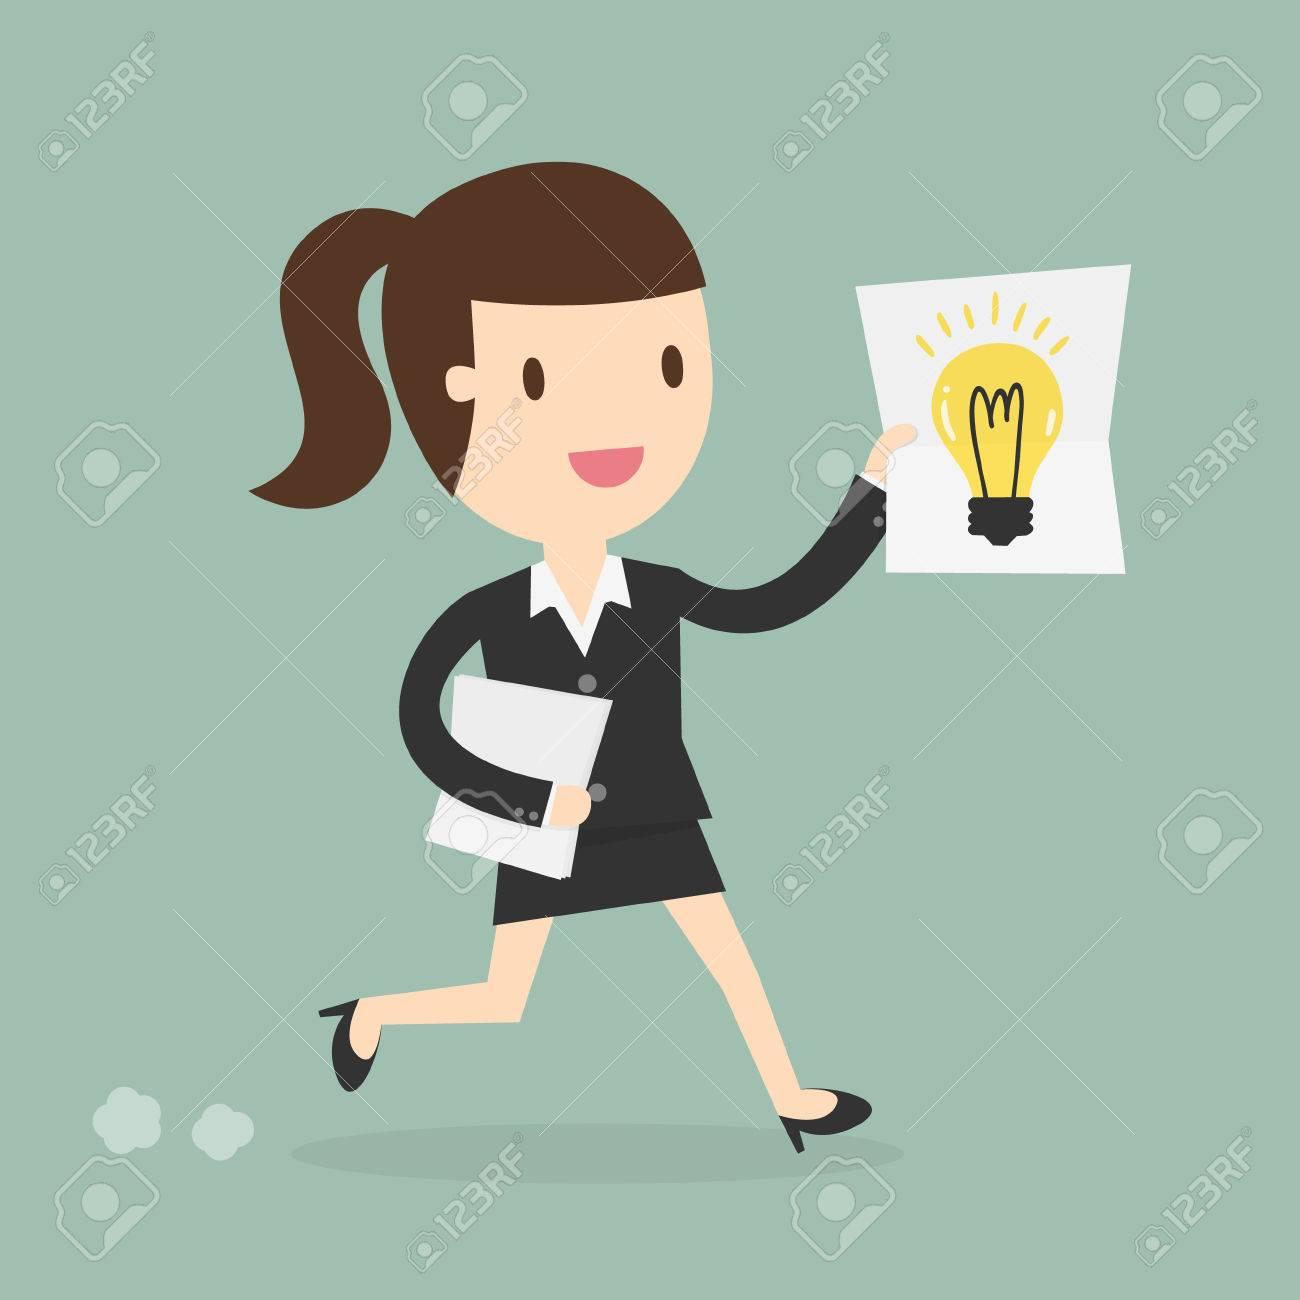 business woman showing she has an idea - 53139139